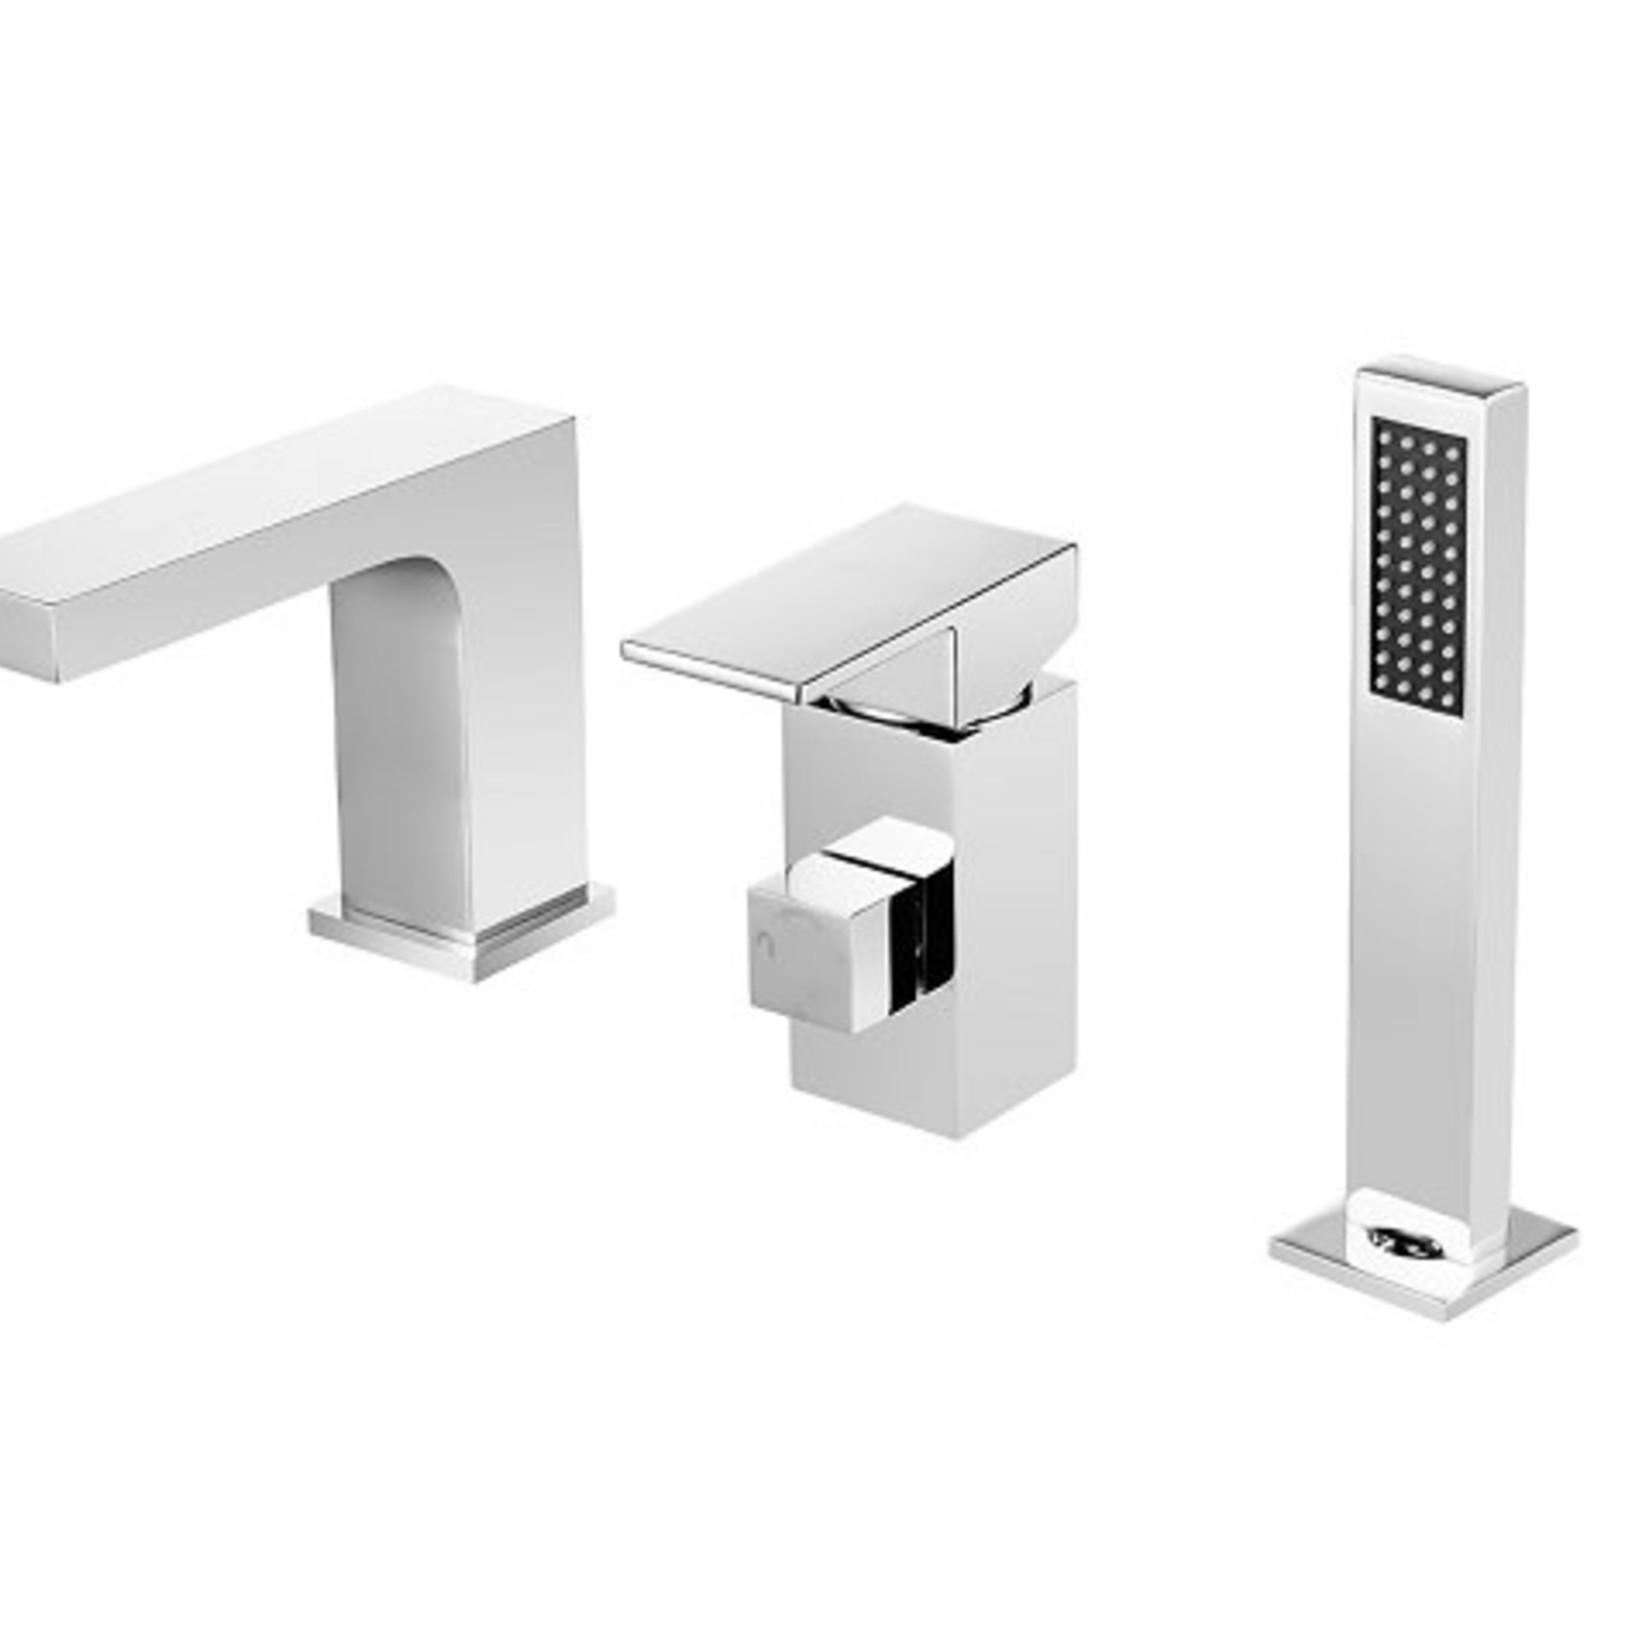 Roman bath faucet chrome MI-3821